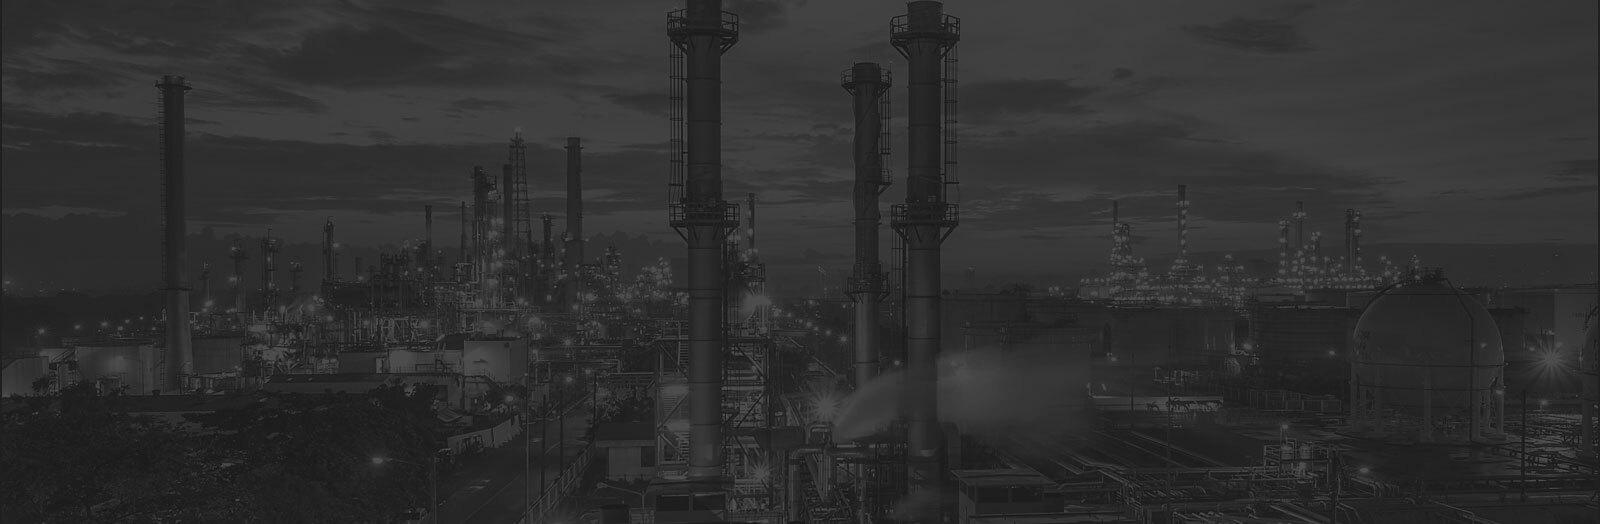 parallax-refinery